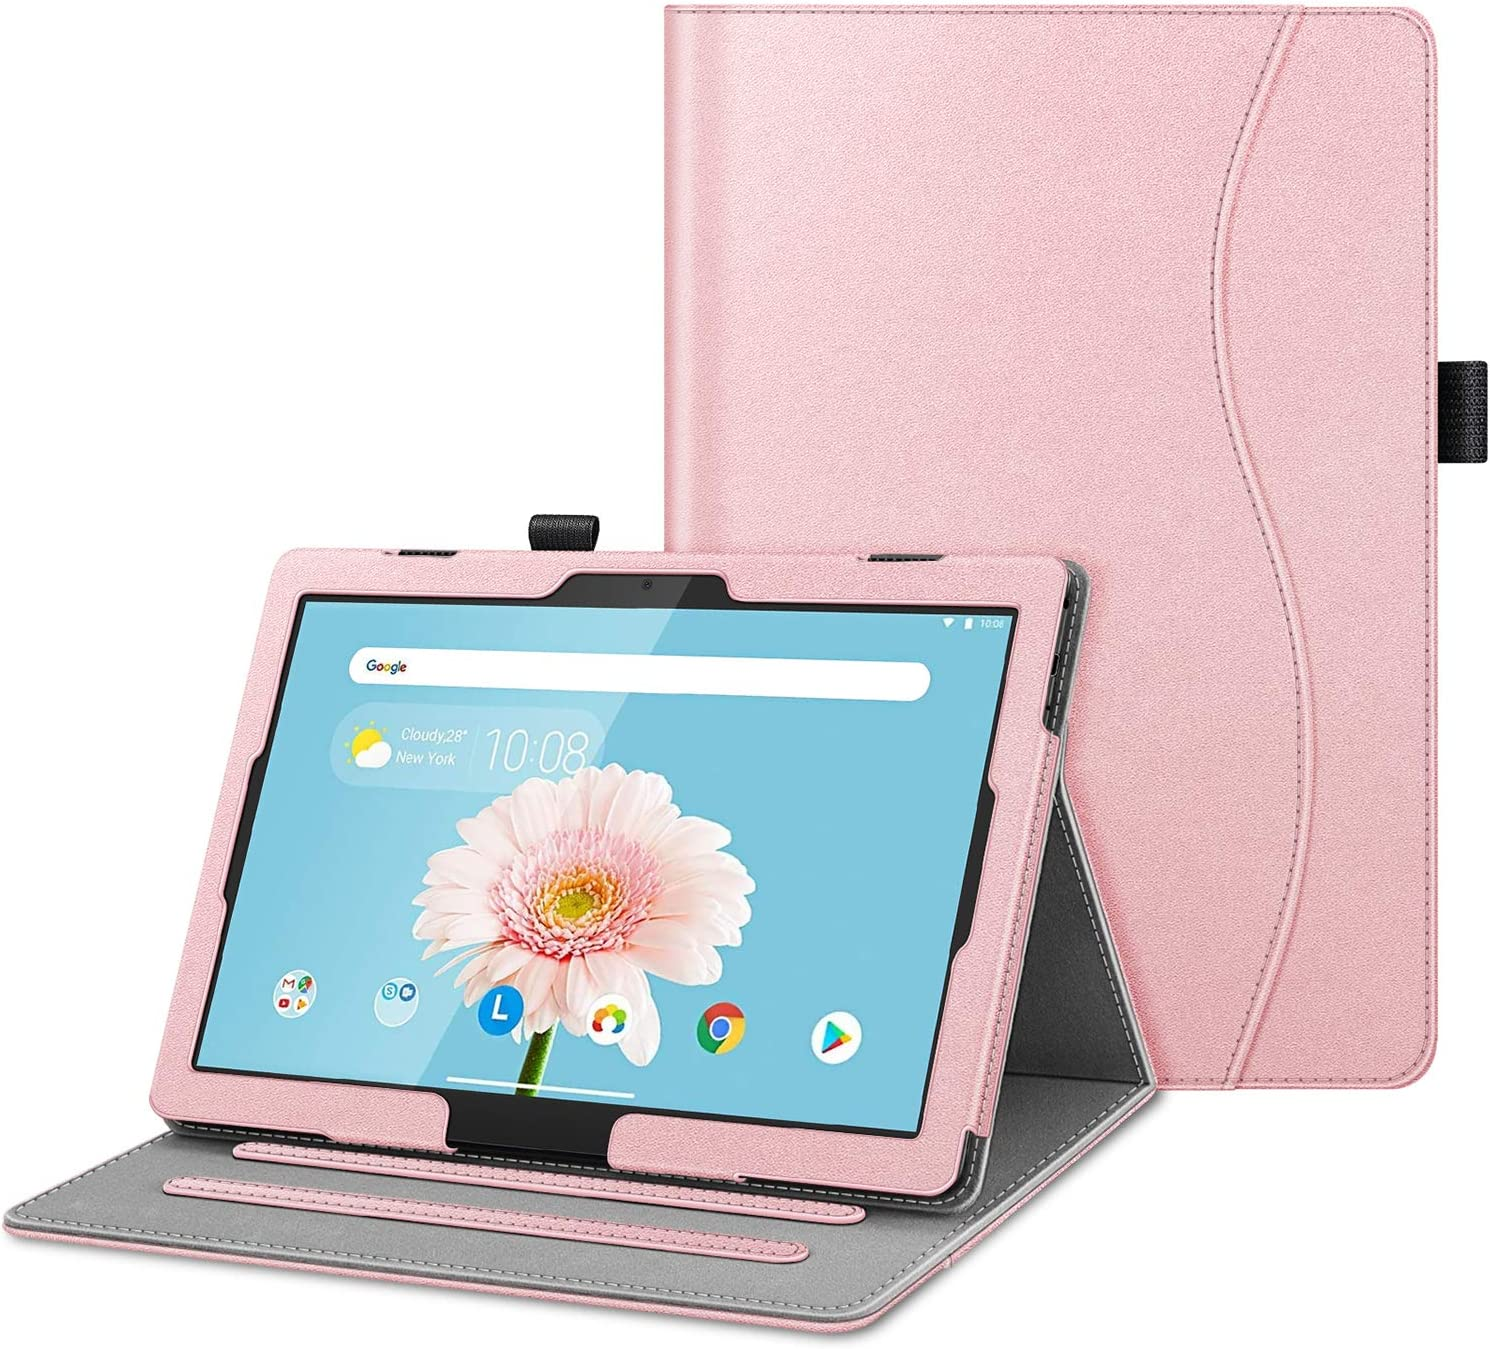 "Fintie Case for Lenovo Smart Tab M10 HD / P10 / M10, Multi-Angle Viewing Folio Cover w/Pocket, Auto Wake/Sleep for Lenovo Tab M10 HD TB-X505F/P10 TB-X705F TB-X705L / M10 TB-X605F 10.1"" Tablet"